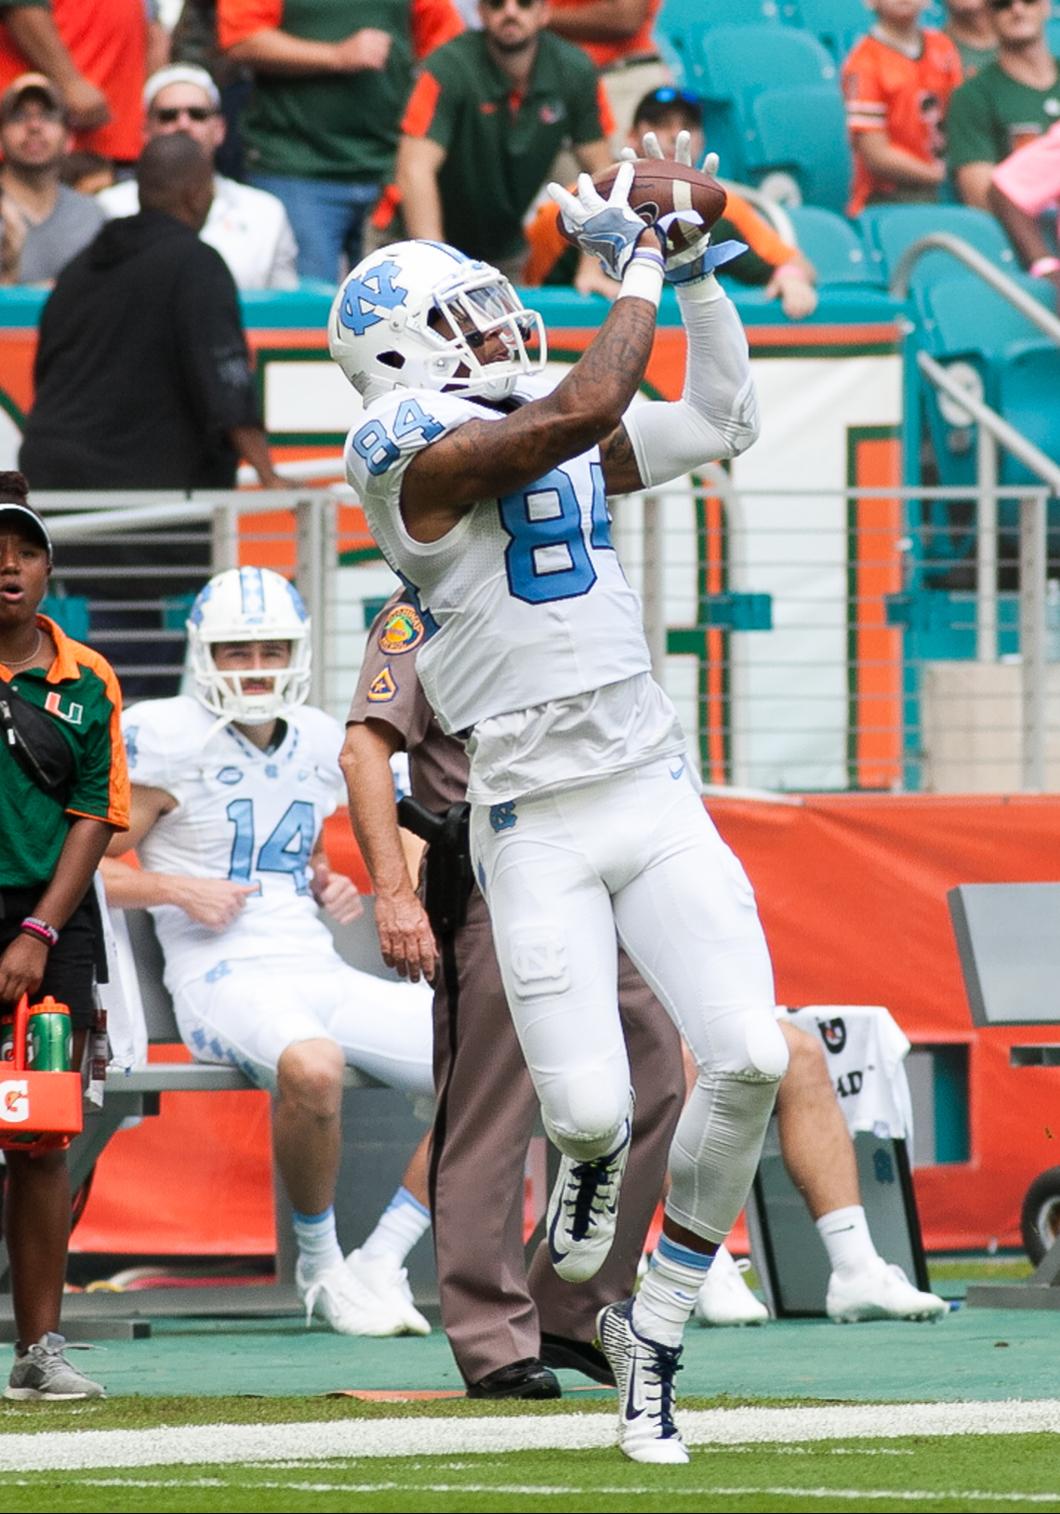 NCAA FOOTBALL: OCT 15 North Carolina at Miami